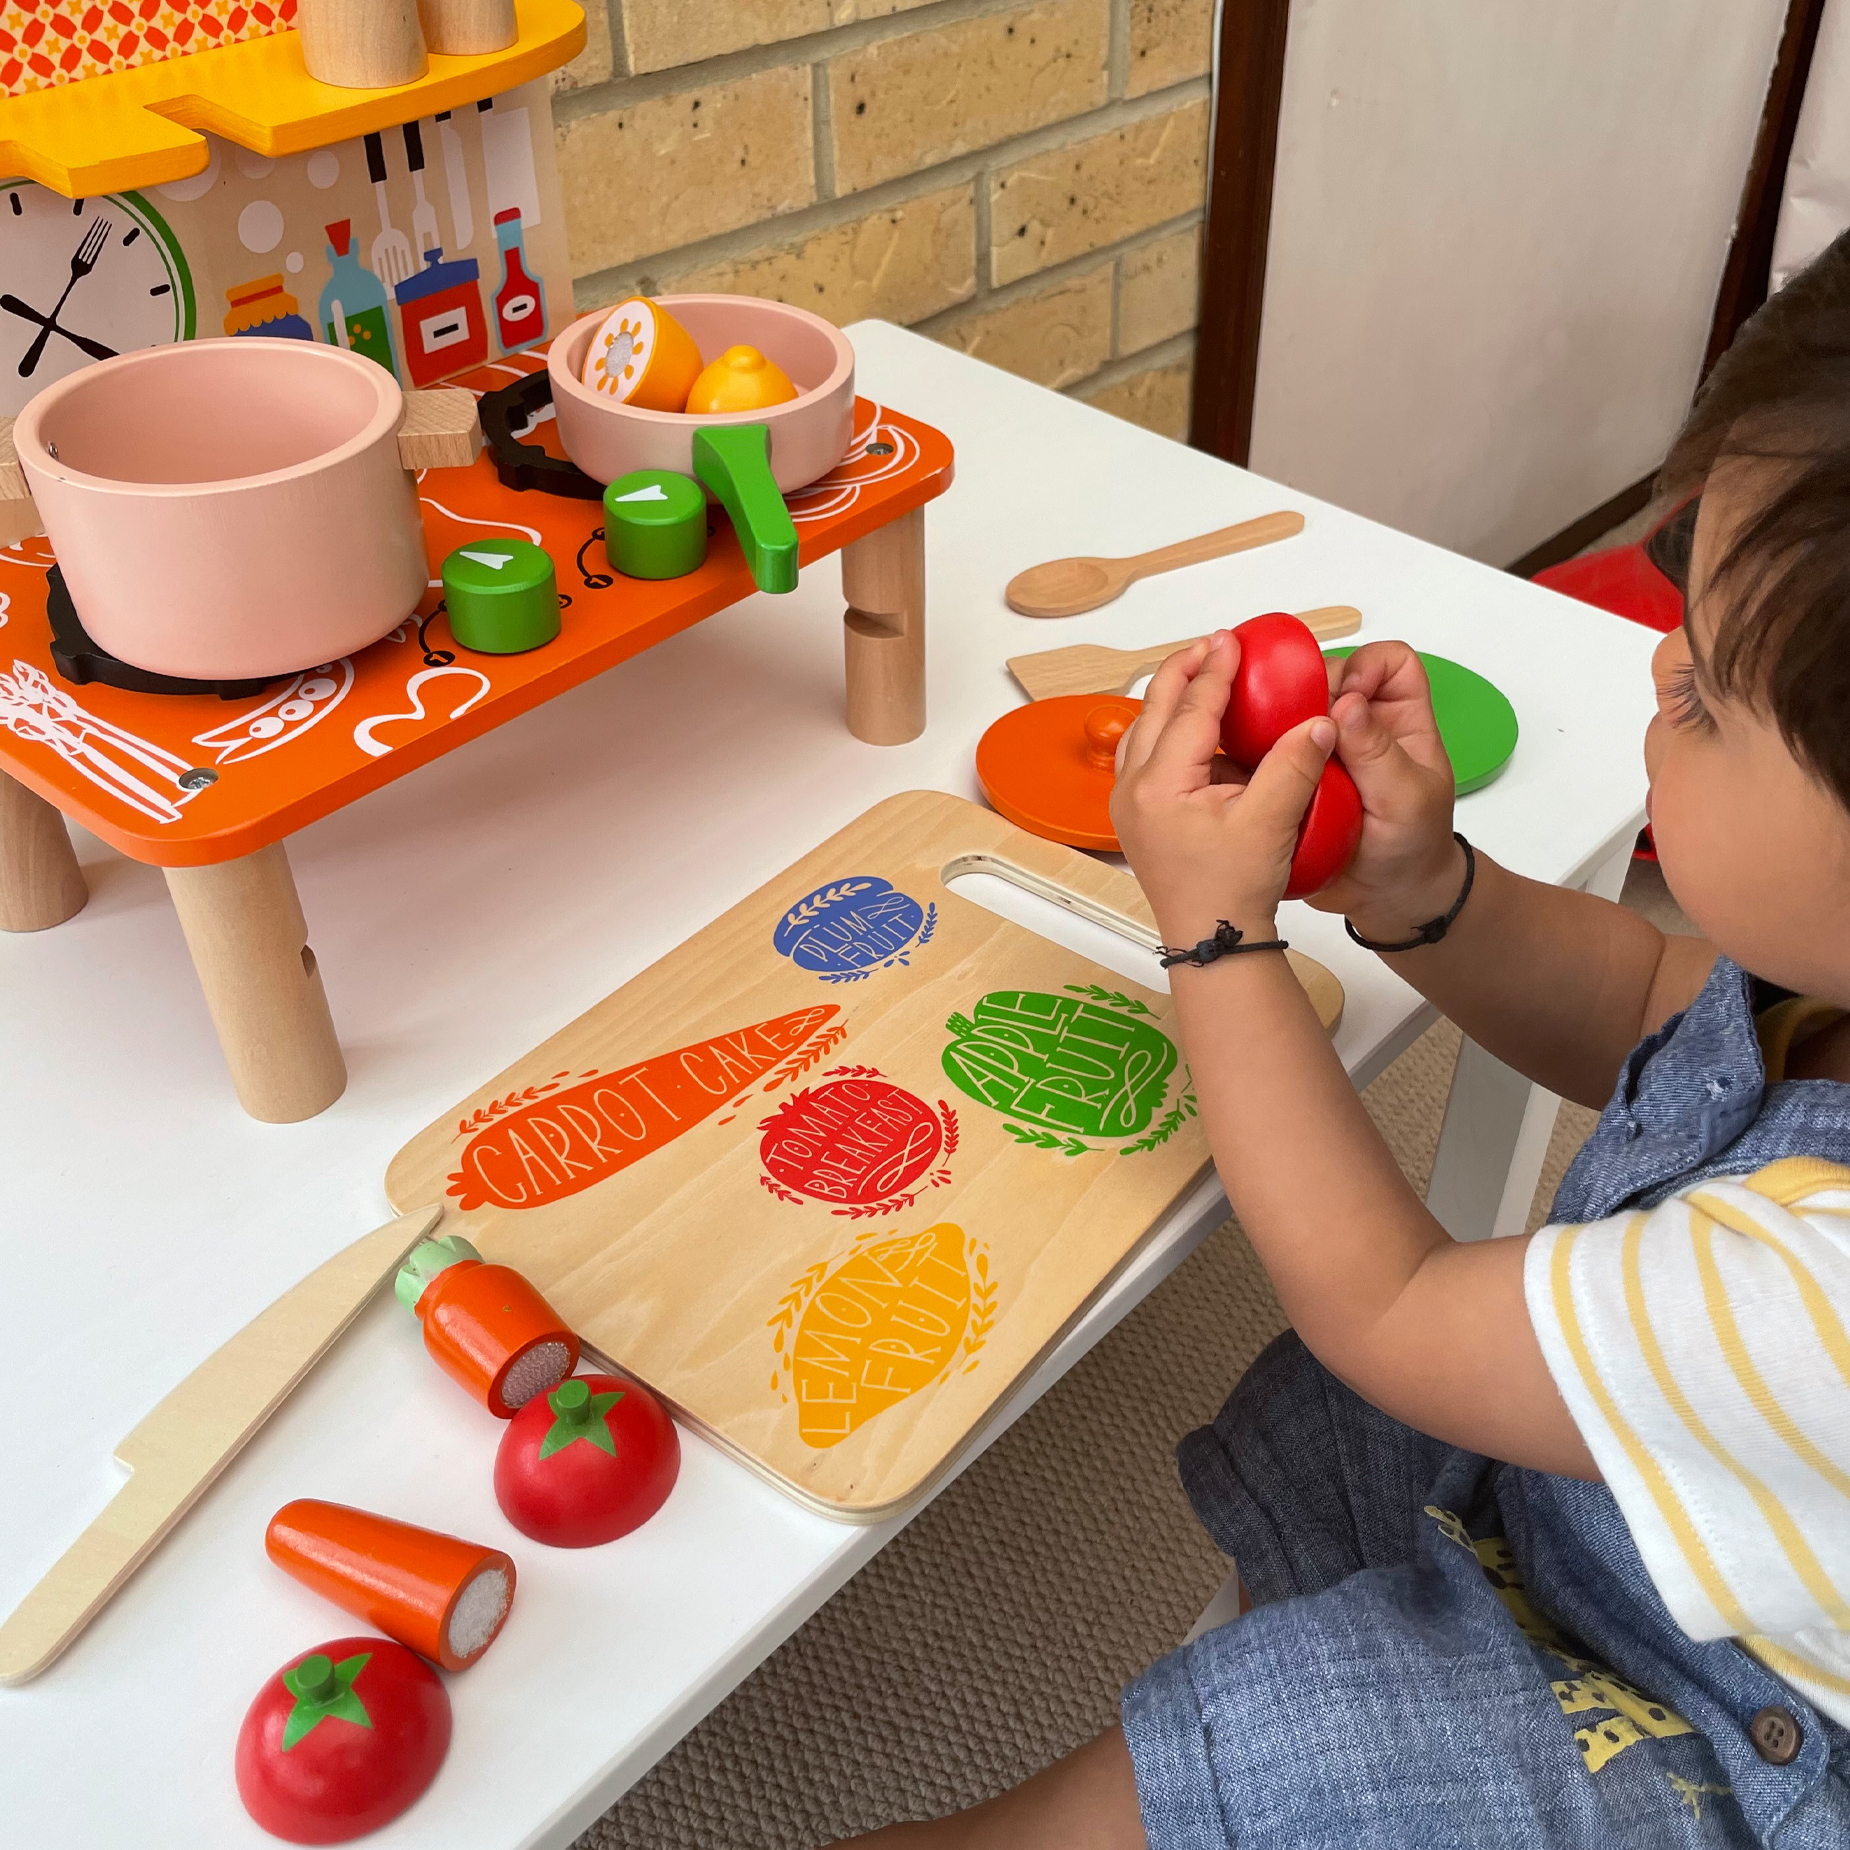 enhance creativity & Motor skills with Perfect Play Kitchen Set